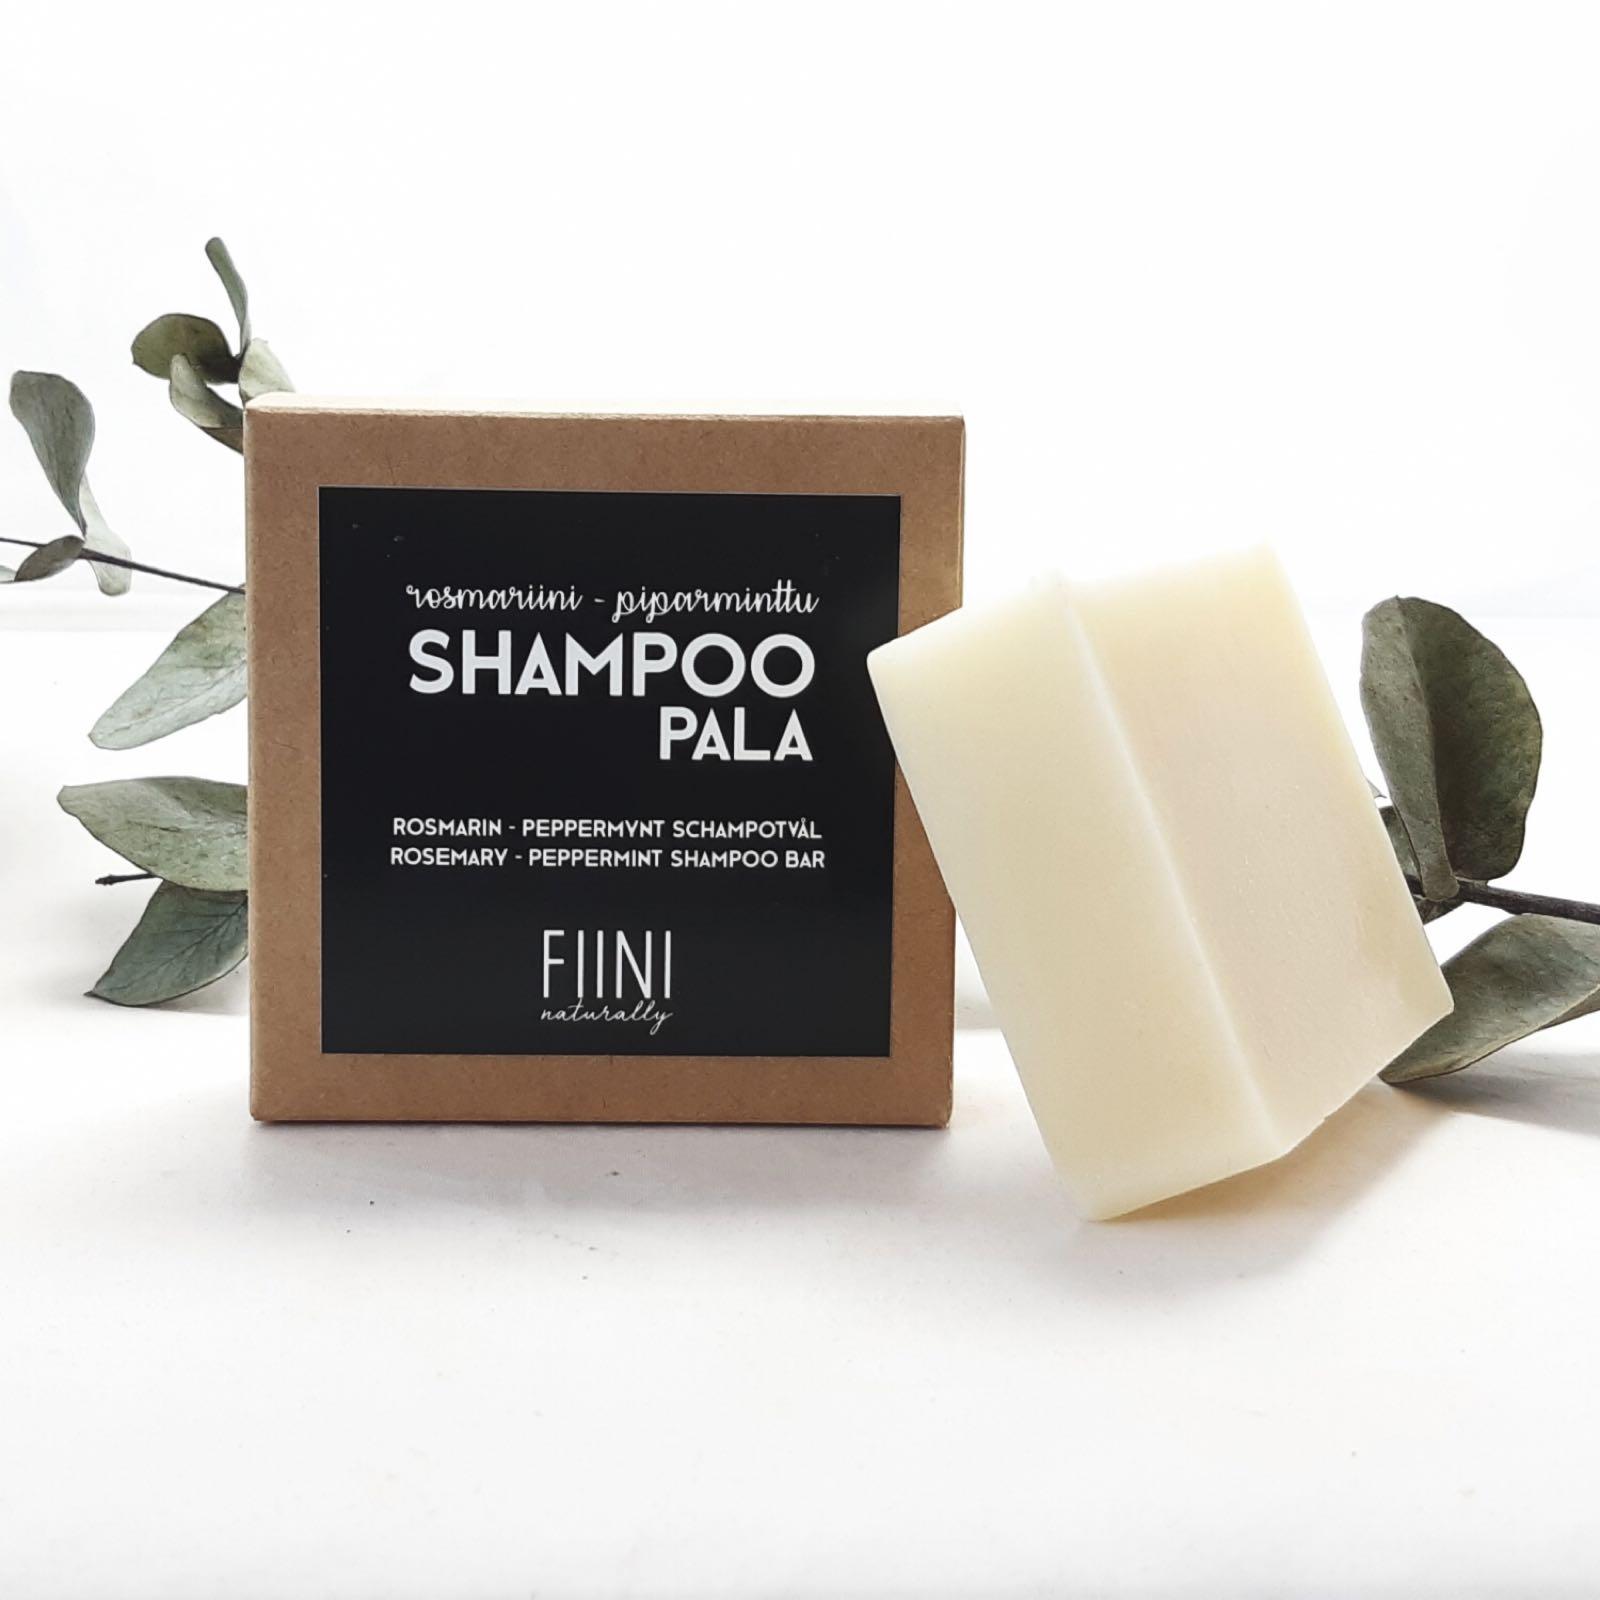 FIINI naturally palashampoo